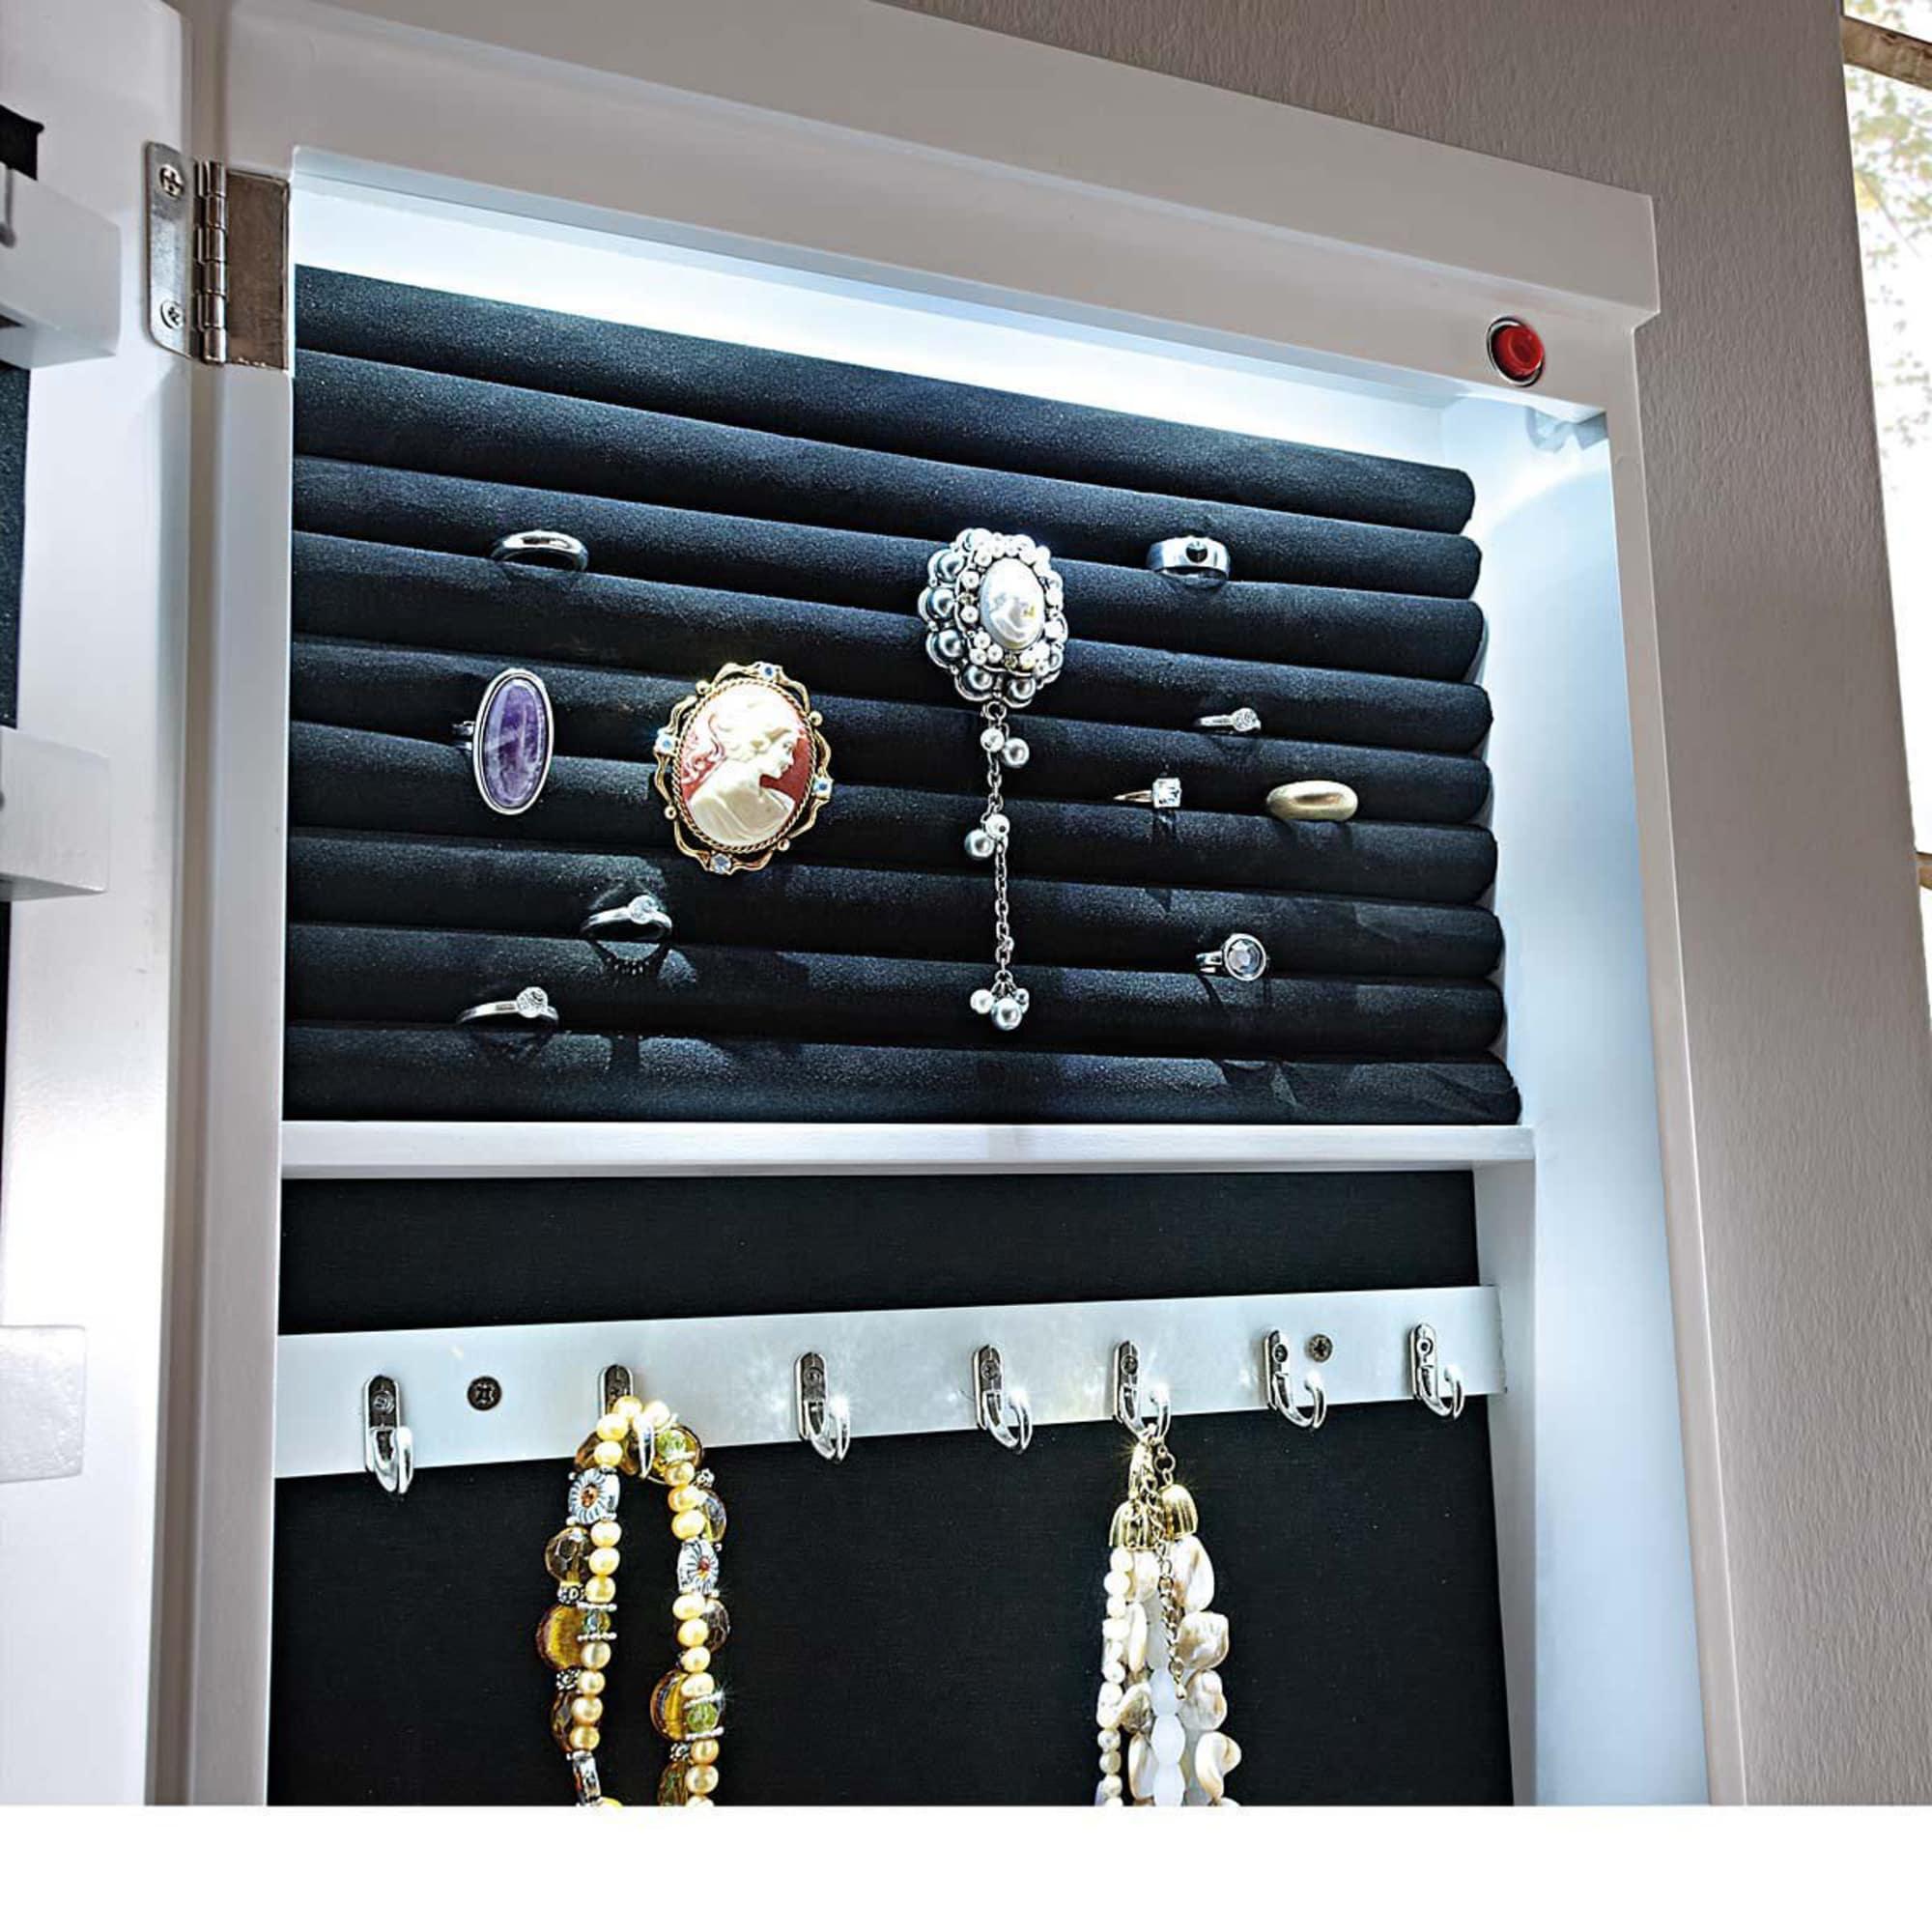 Schmuckschrank Spiegel, mit LED Beleuchtung, Holz